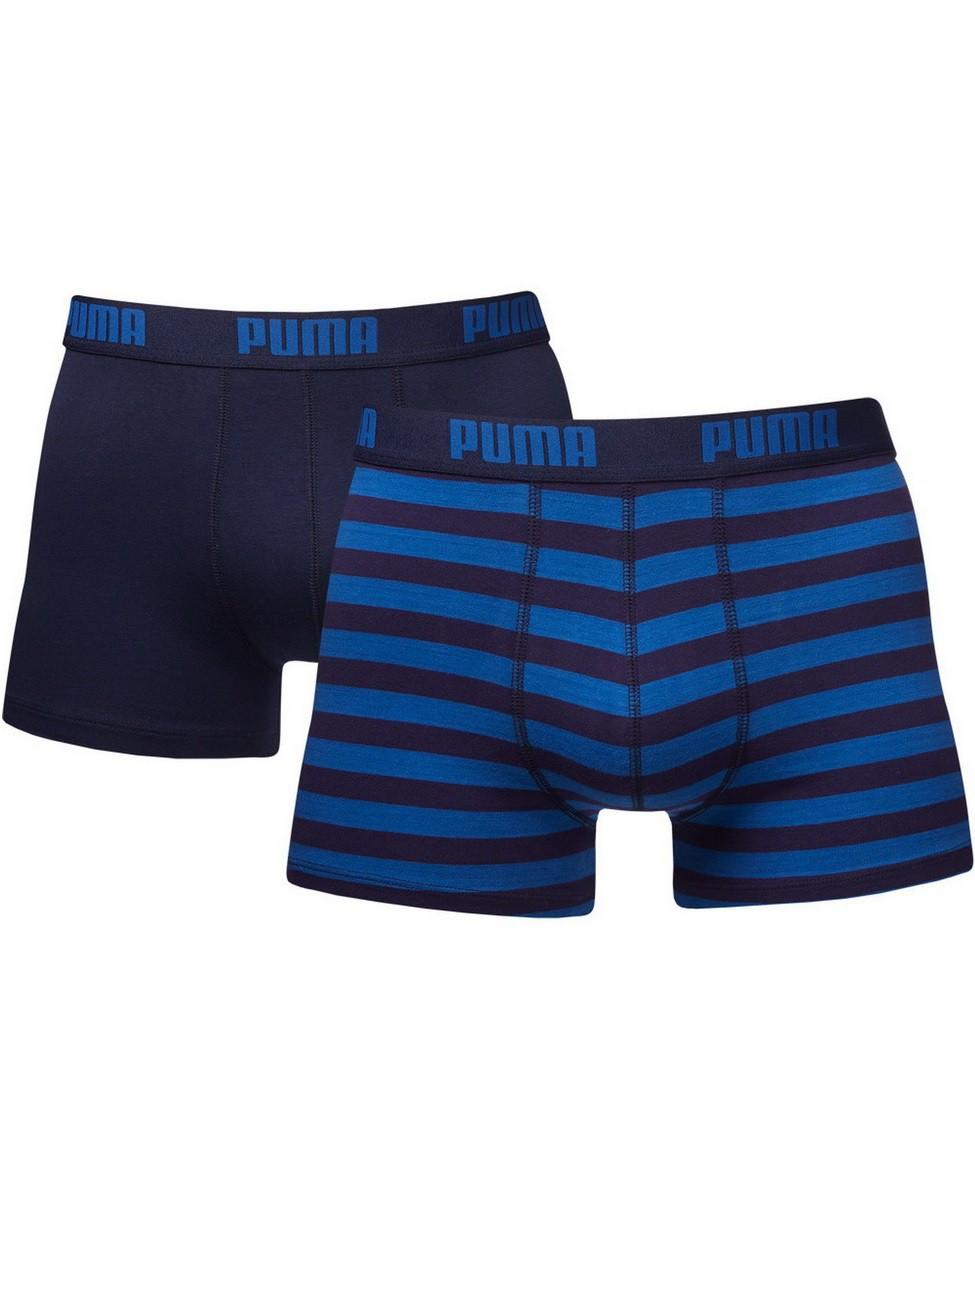 Puma Herren Boxershort Stripe Boxer 2er Pack L, blue (056).